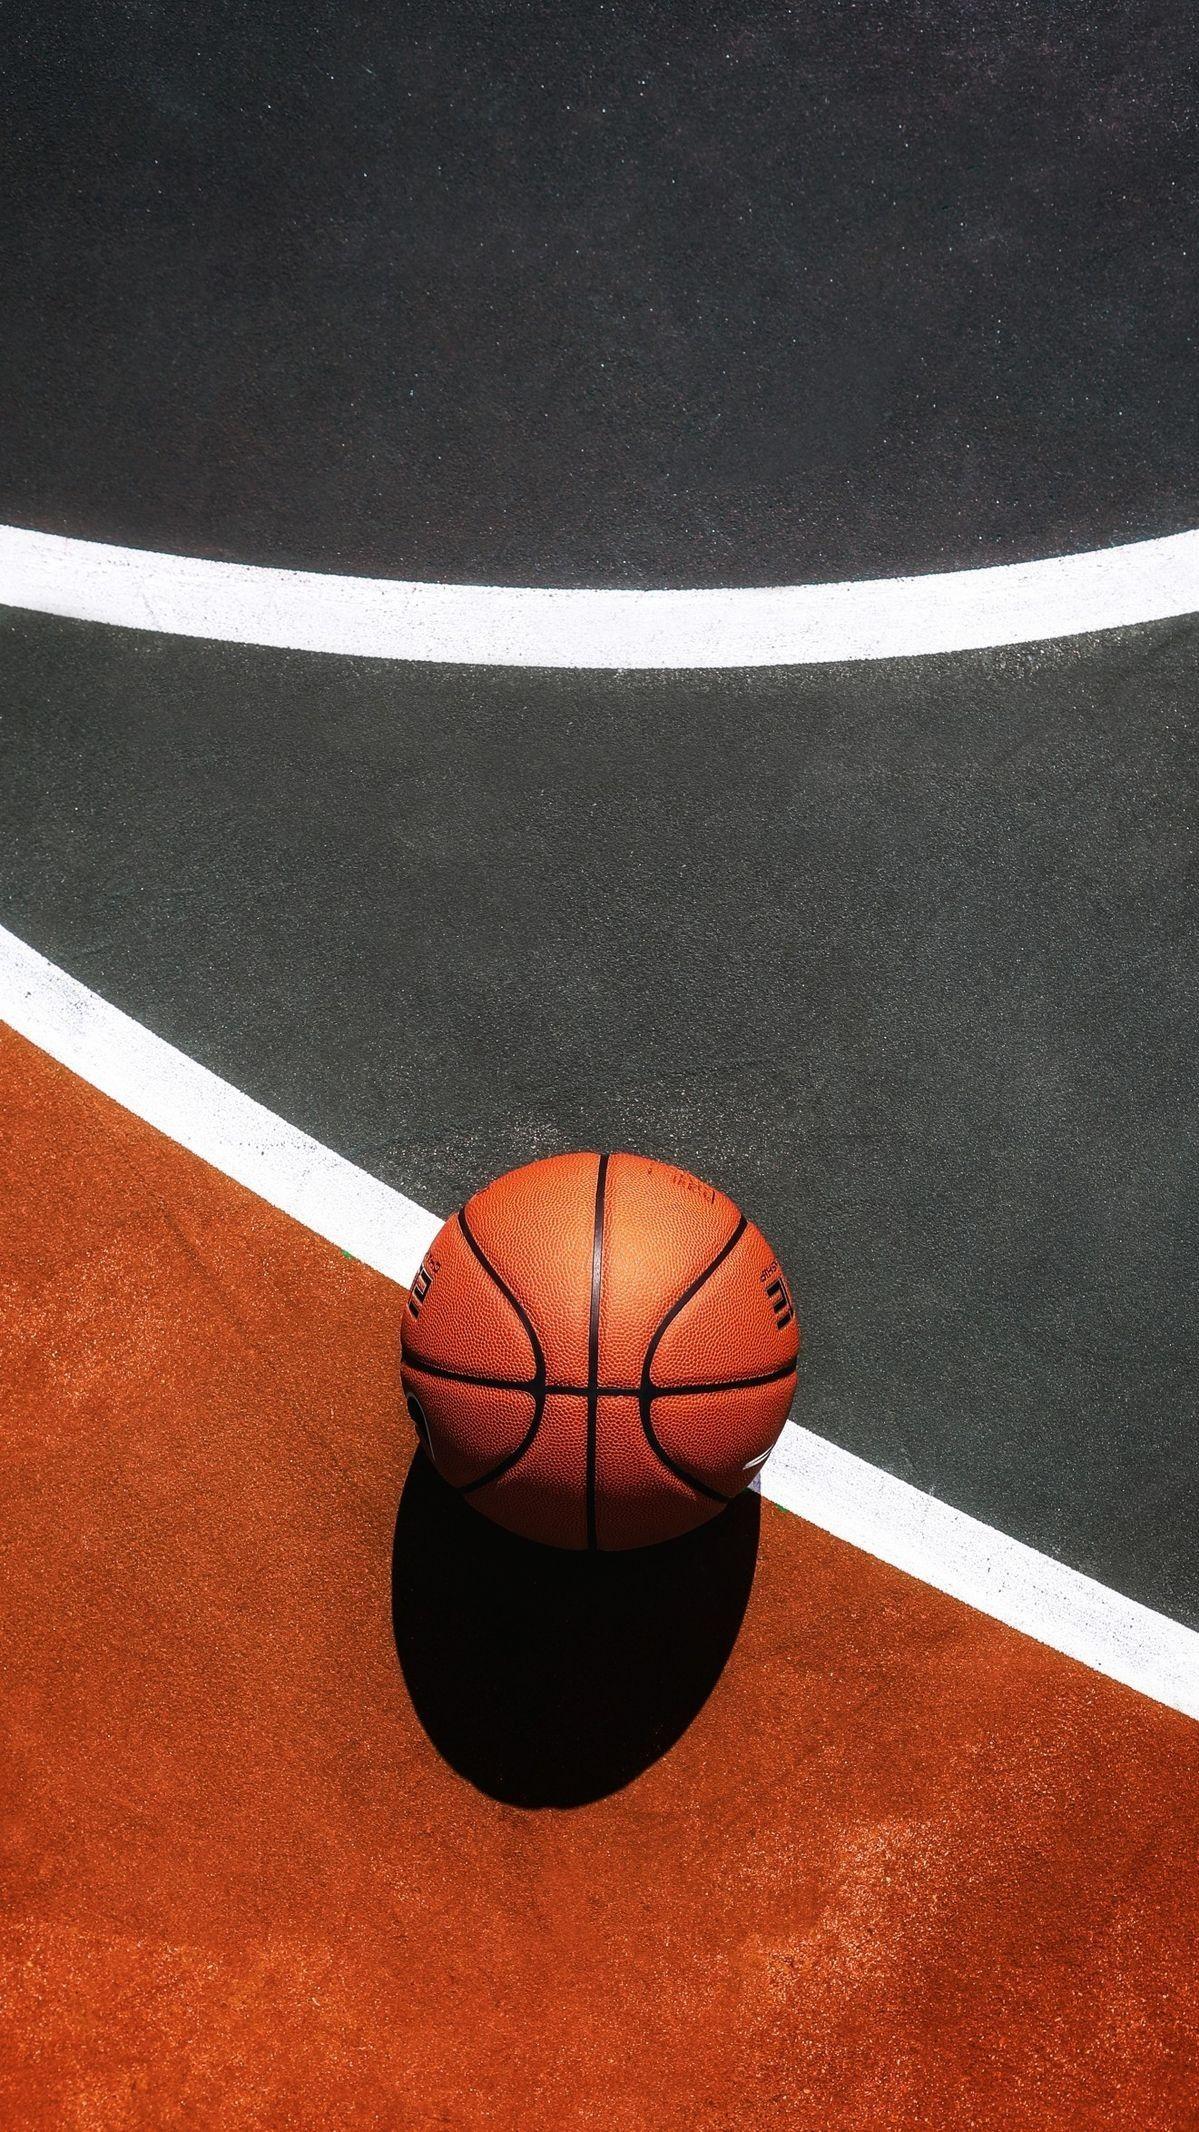 Pin Di Gambar Bola Basket